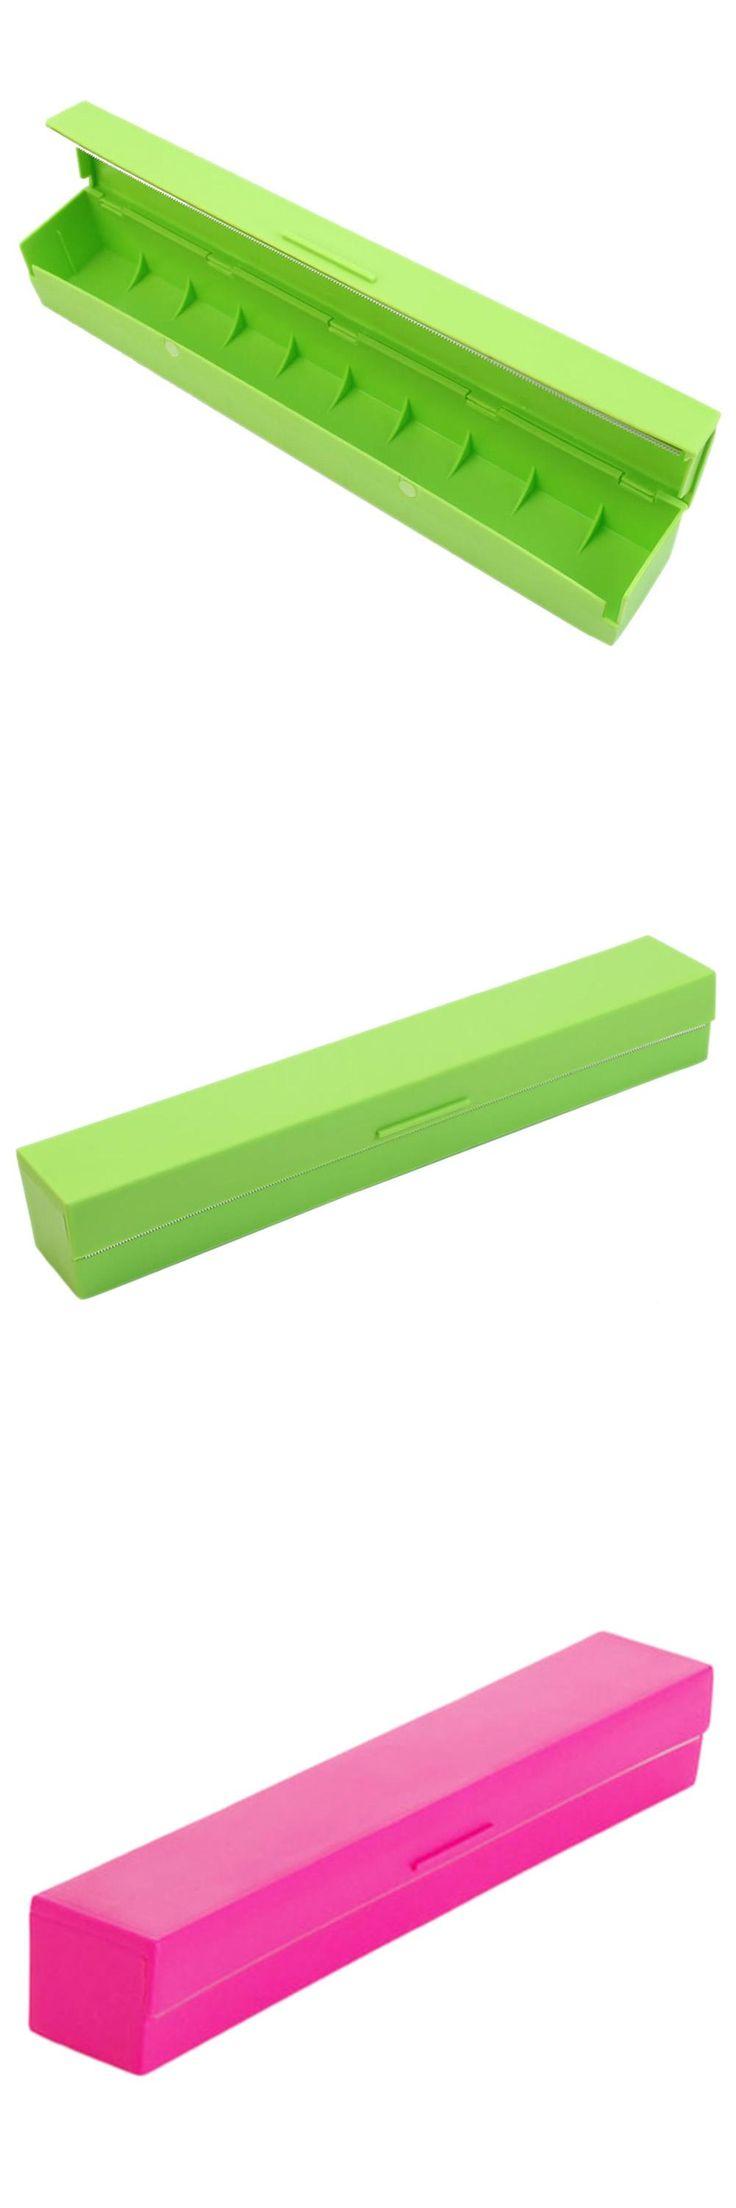 [Visit to Buy] Plastic Kitchen Foil And Cling Film Wrap Dispenser Cutter Storage Holder #Advertisement